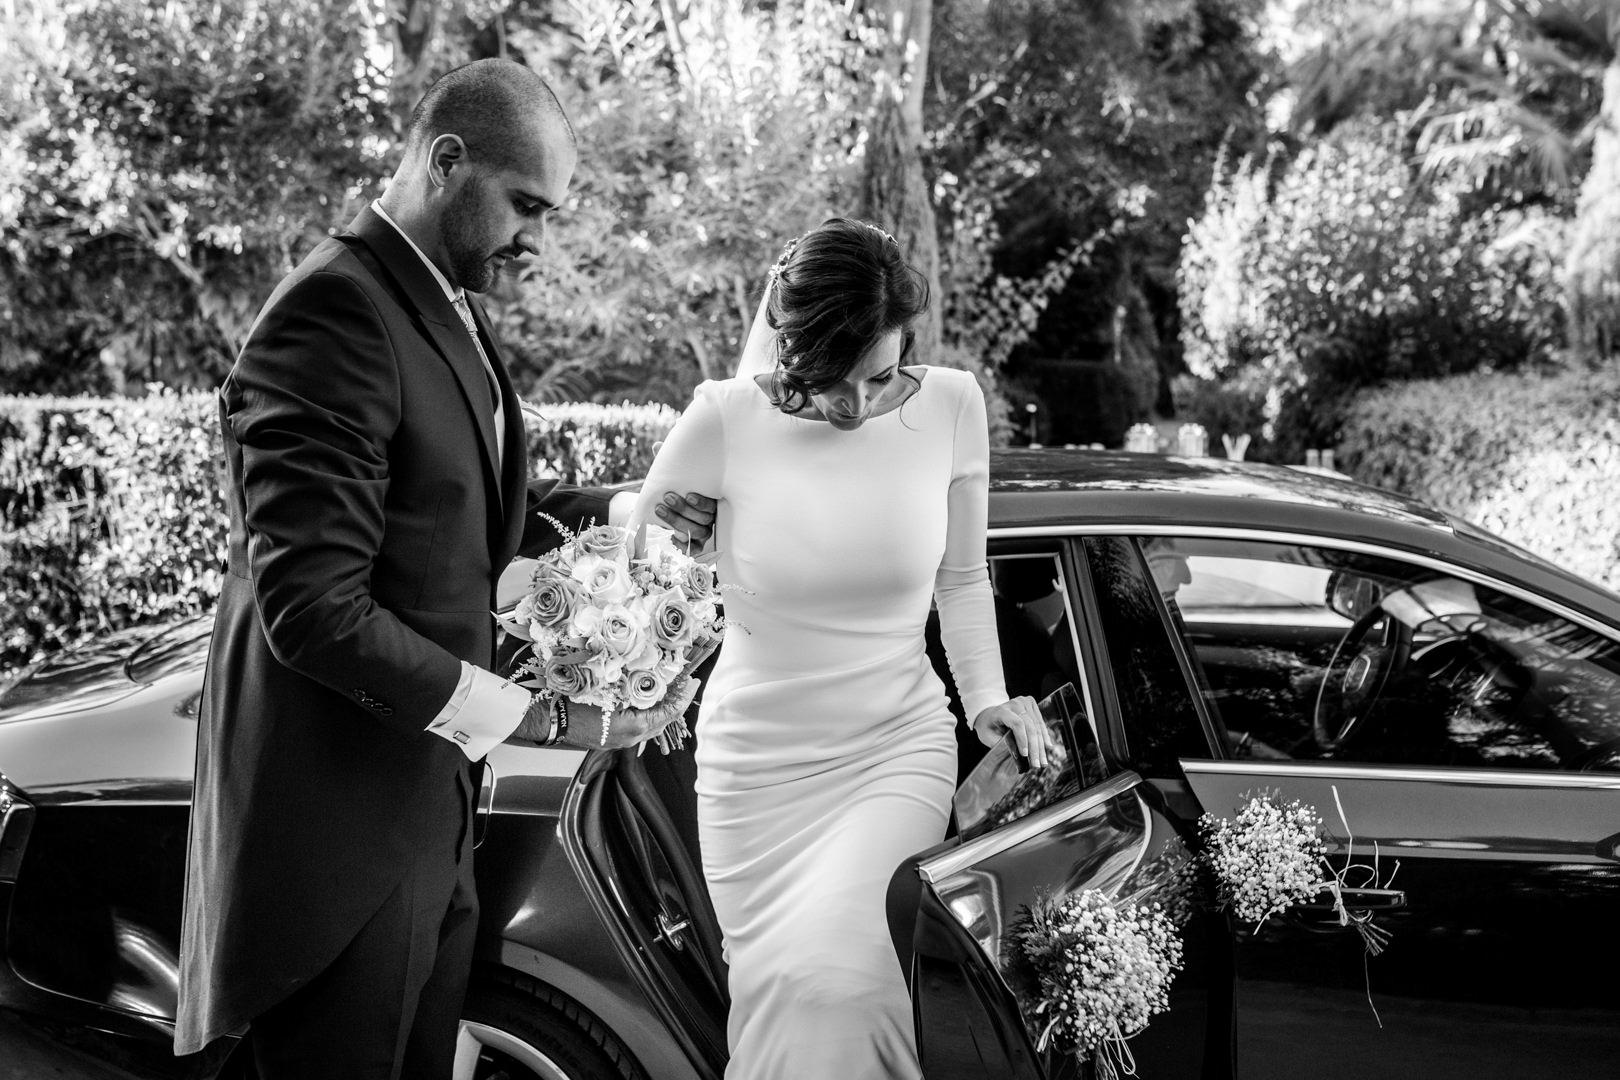 Boda-Irene-Marcos-Dos-Hermanas-Finca-Clotidle-engagement-Rafael-Torres-fotografo-bodas-sevilla-madrid-barcelona-wedding-photographer--16.jpg